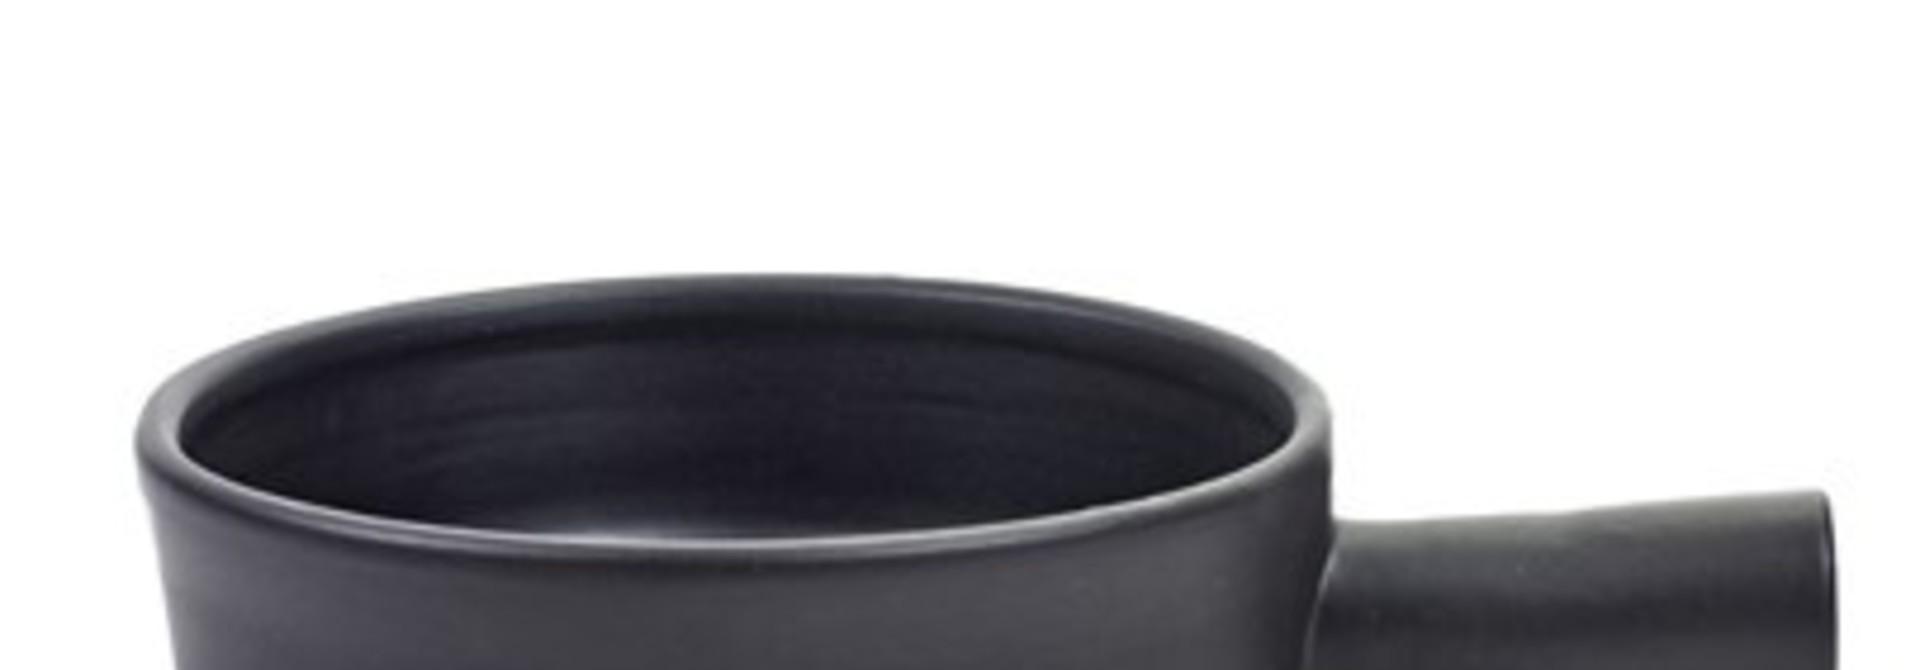 "8.25"" Terracotta Pan - Black"